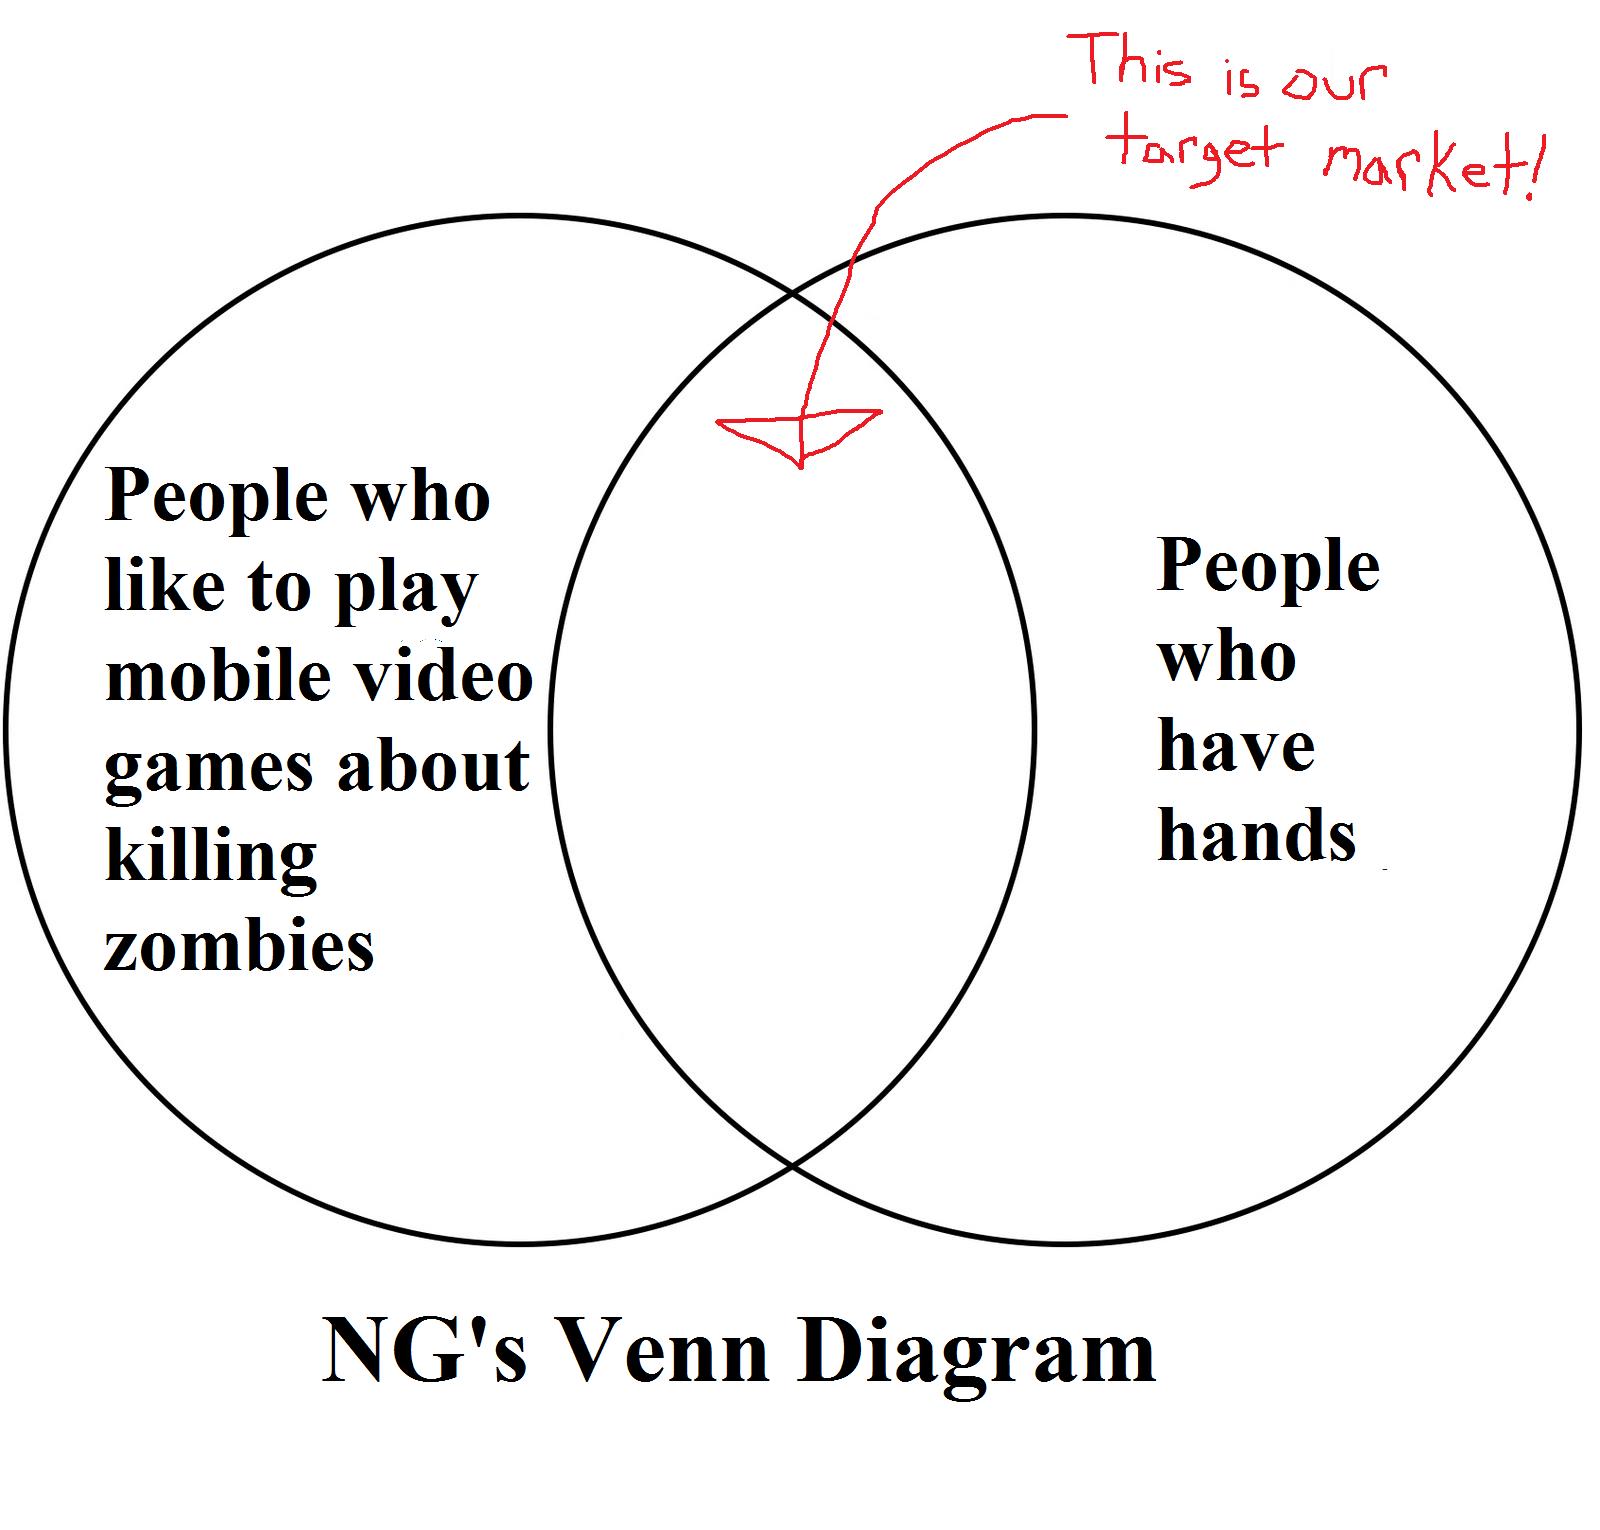 Venn diagrams nextgames smart pooptronica